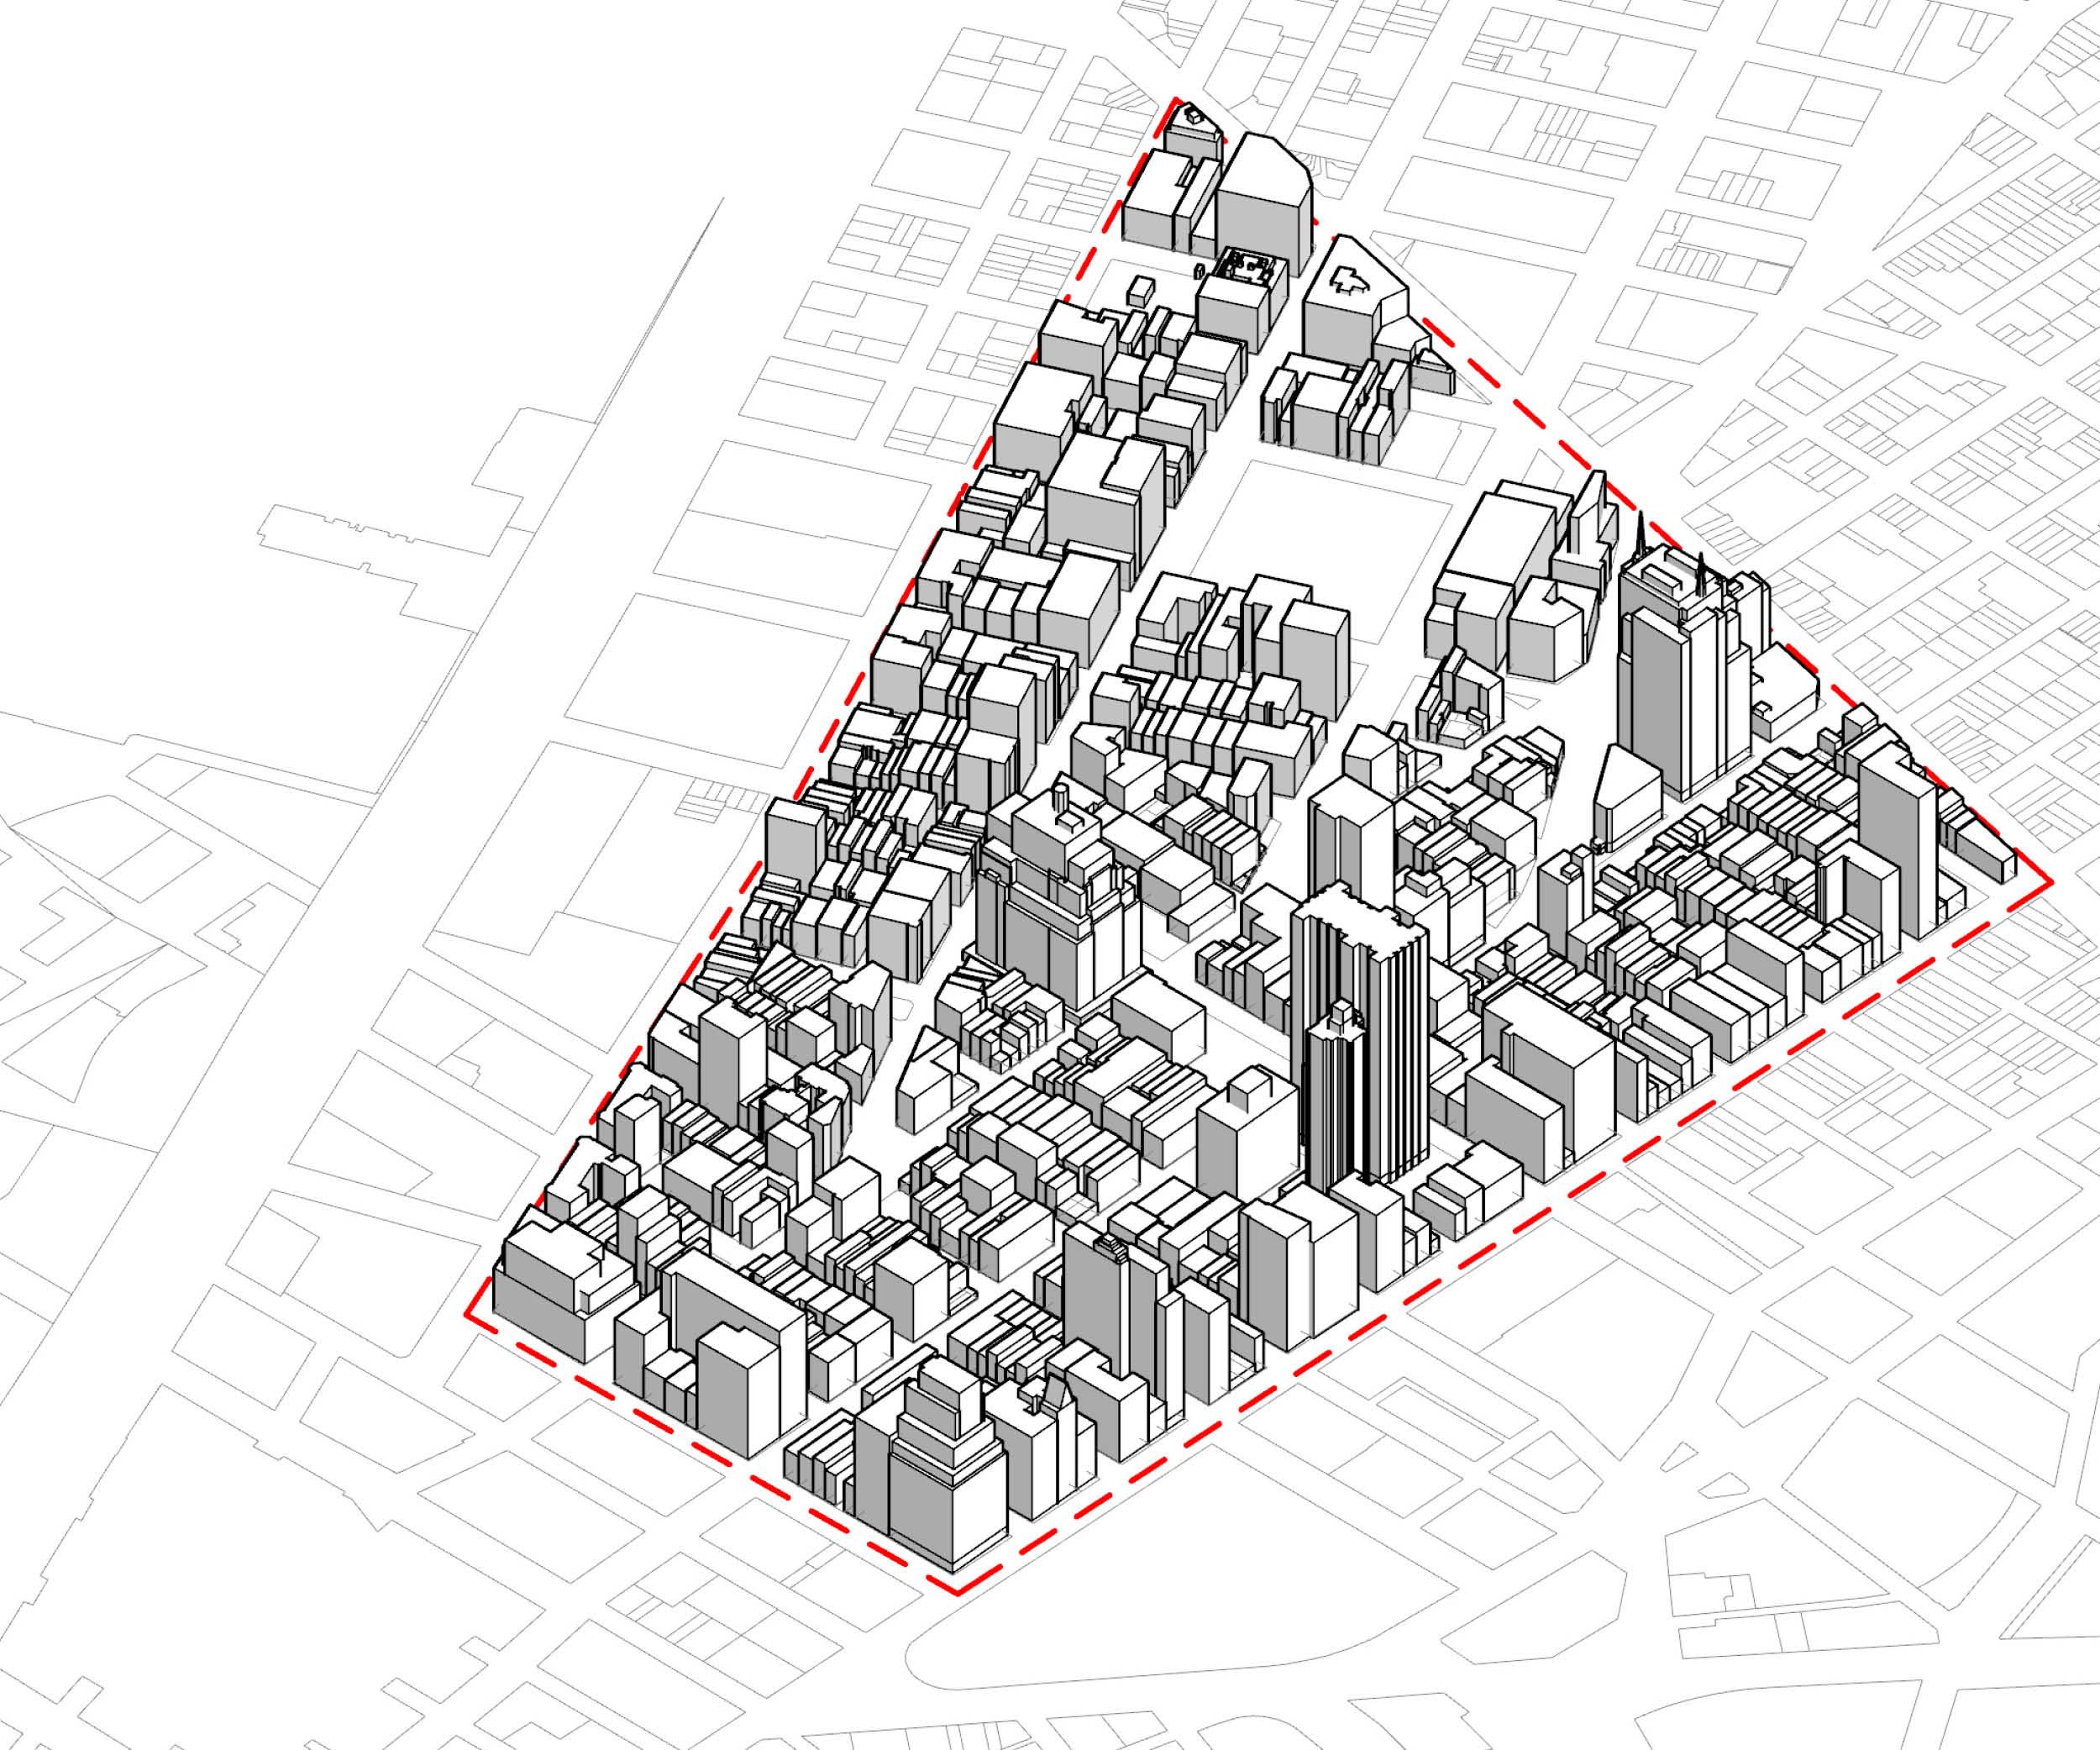 Tribeca   LD FAR: 3.8  NYC FAR: 7.0